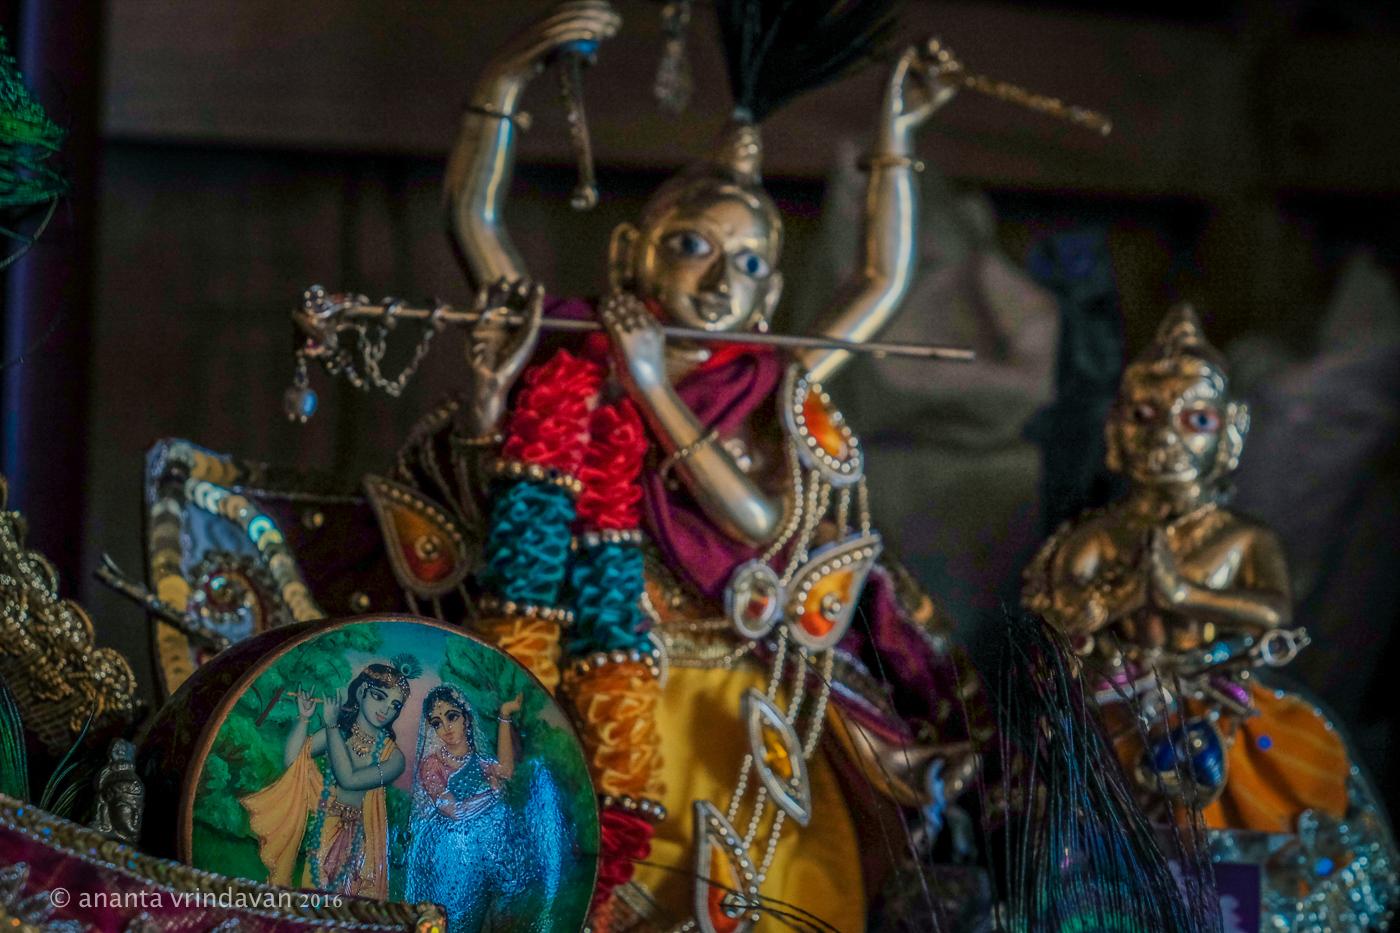 Small Deities of Gaura Nitai; Photo: Ananta Vrindavan